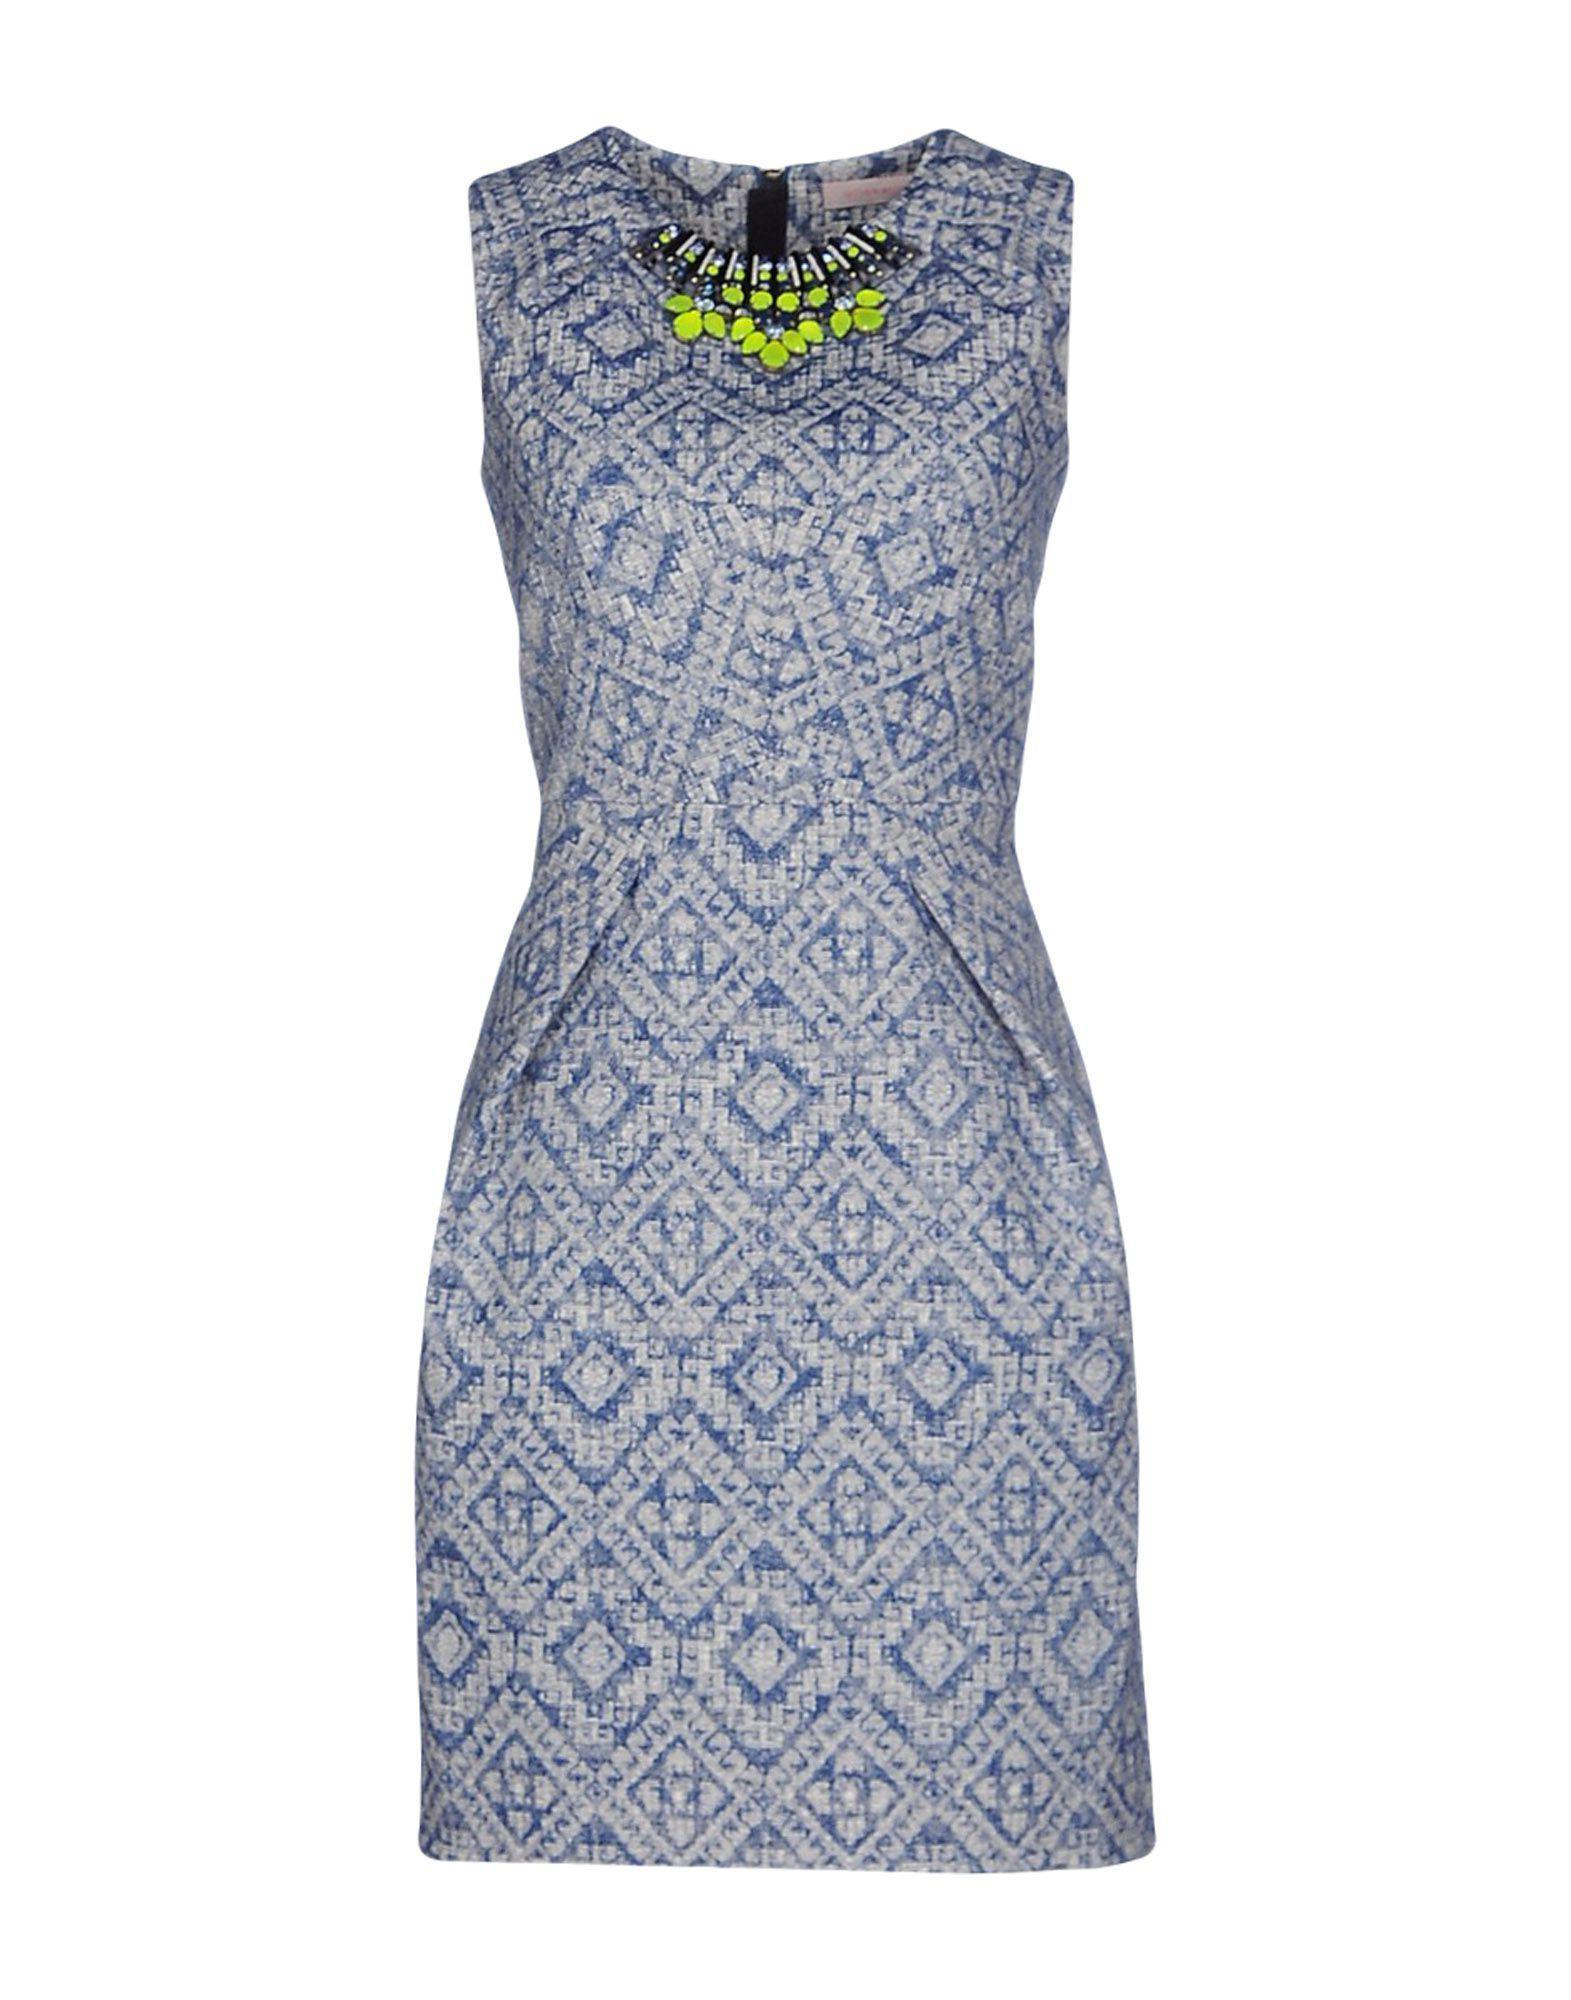 Matthew Williamson Woman Pompom-trimmed Printed Silk Mini Dress Turquoise Size 6 Matthew Williamson qU3WblVtcM